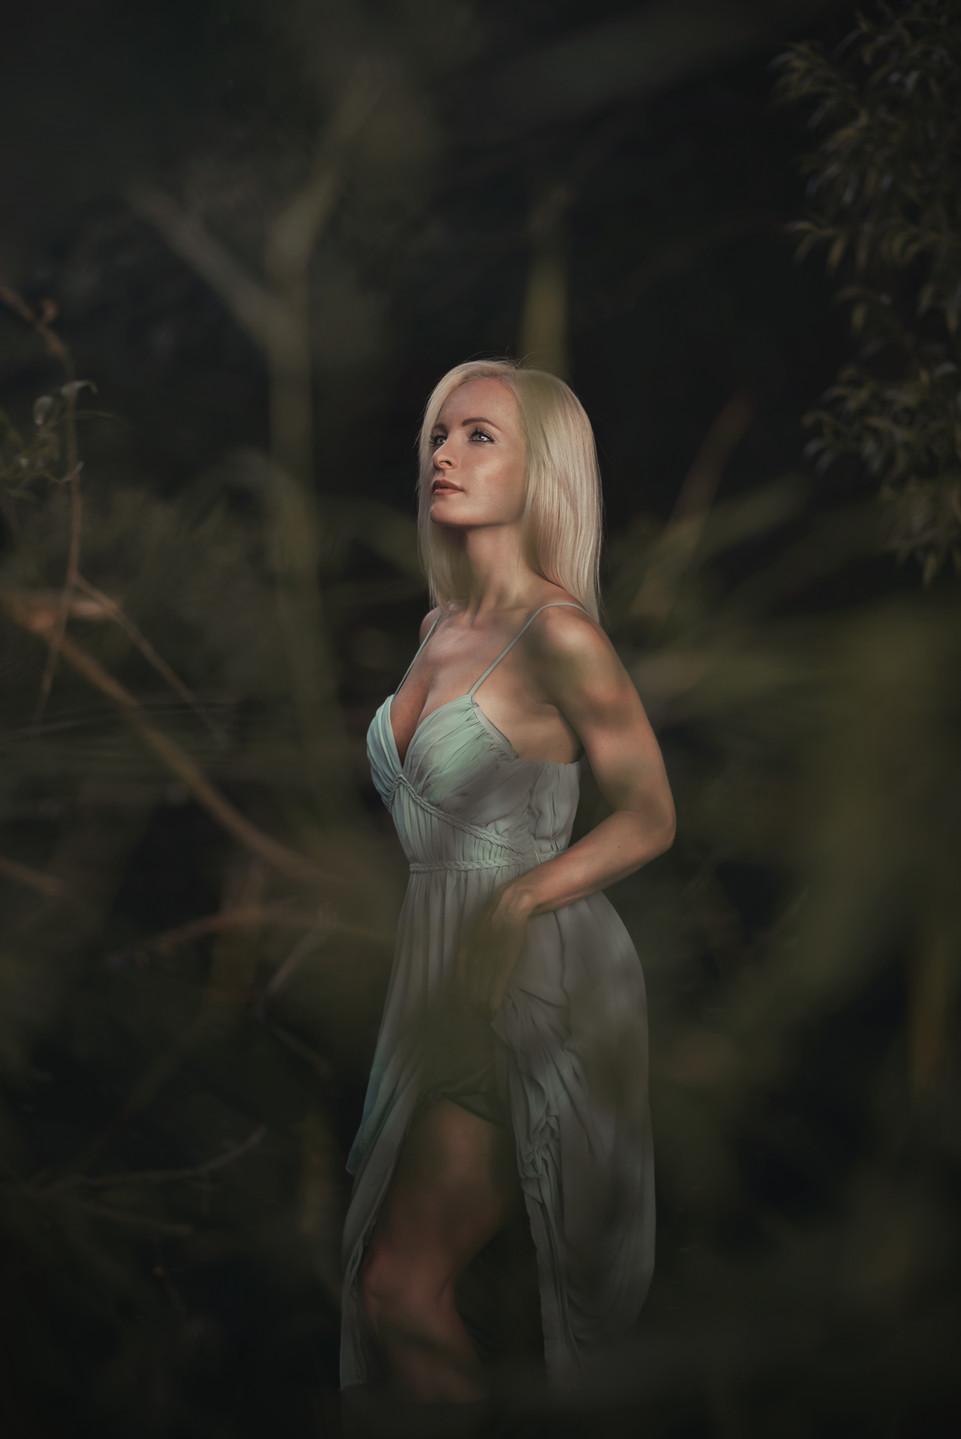 Daniela 2020